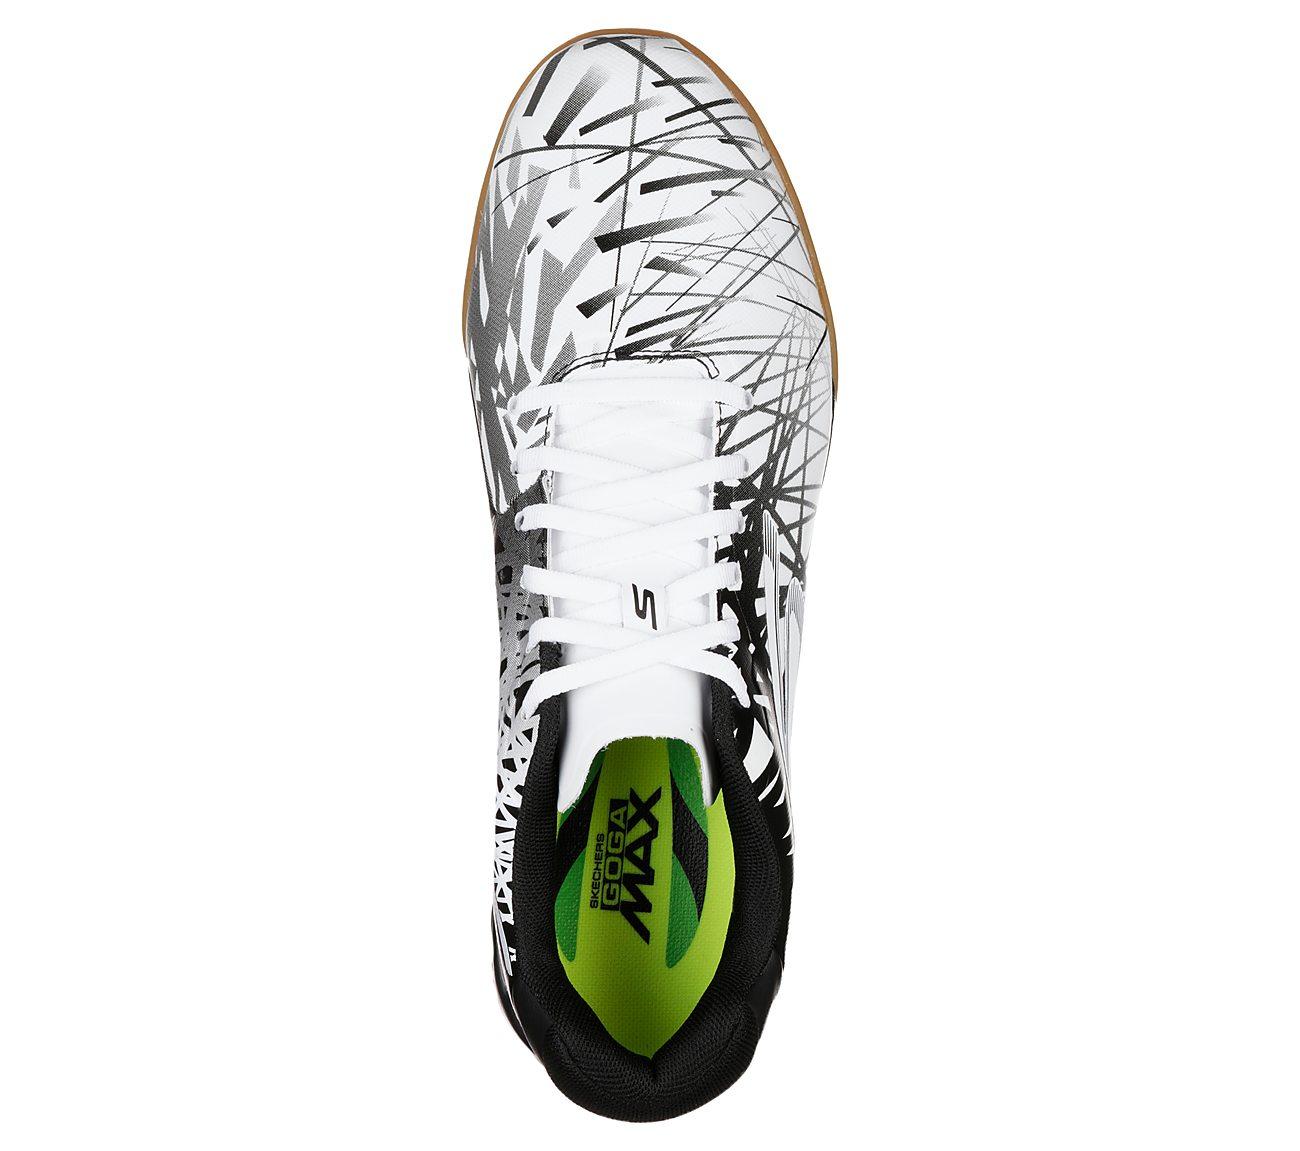 c7c782e76 Buy SKECHERS Skechers Performance - Soccer Leverage Powerplay ...